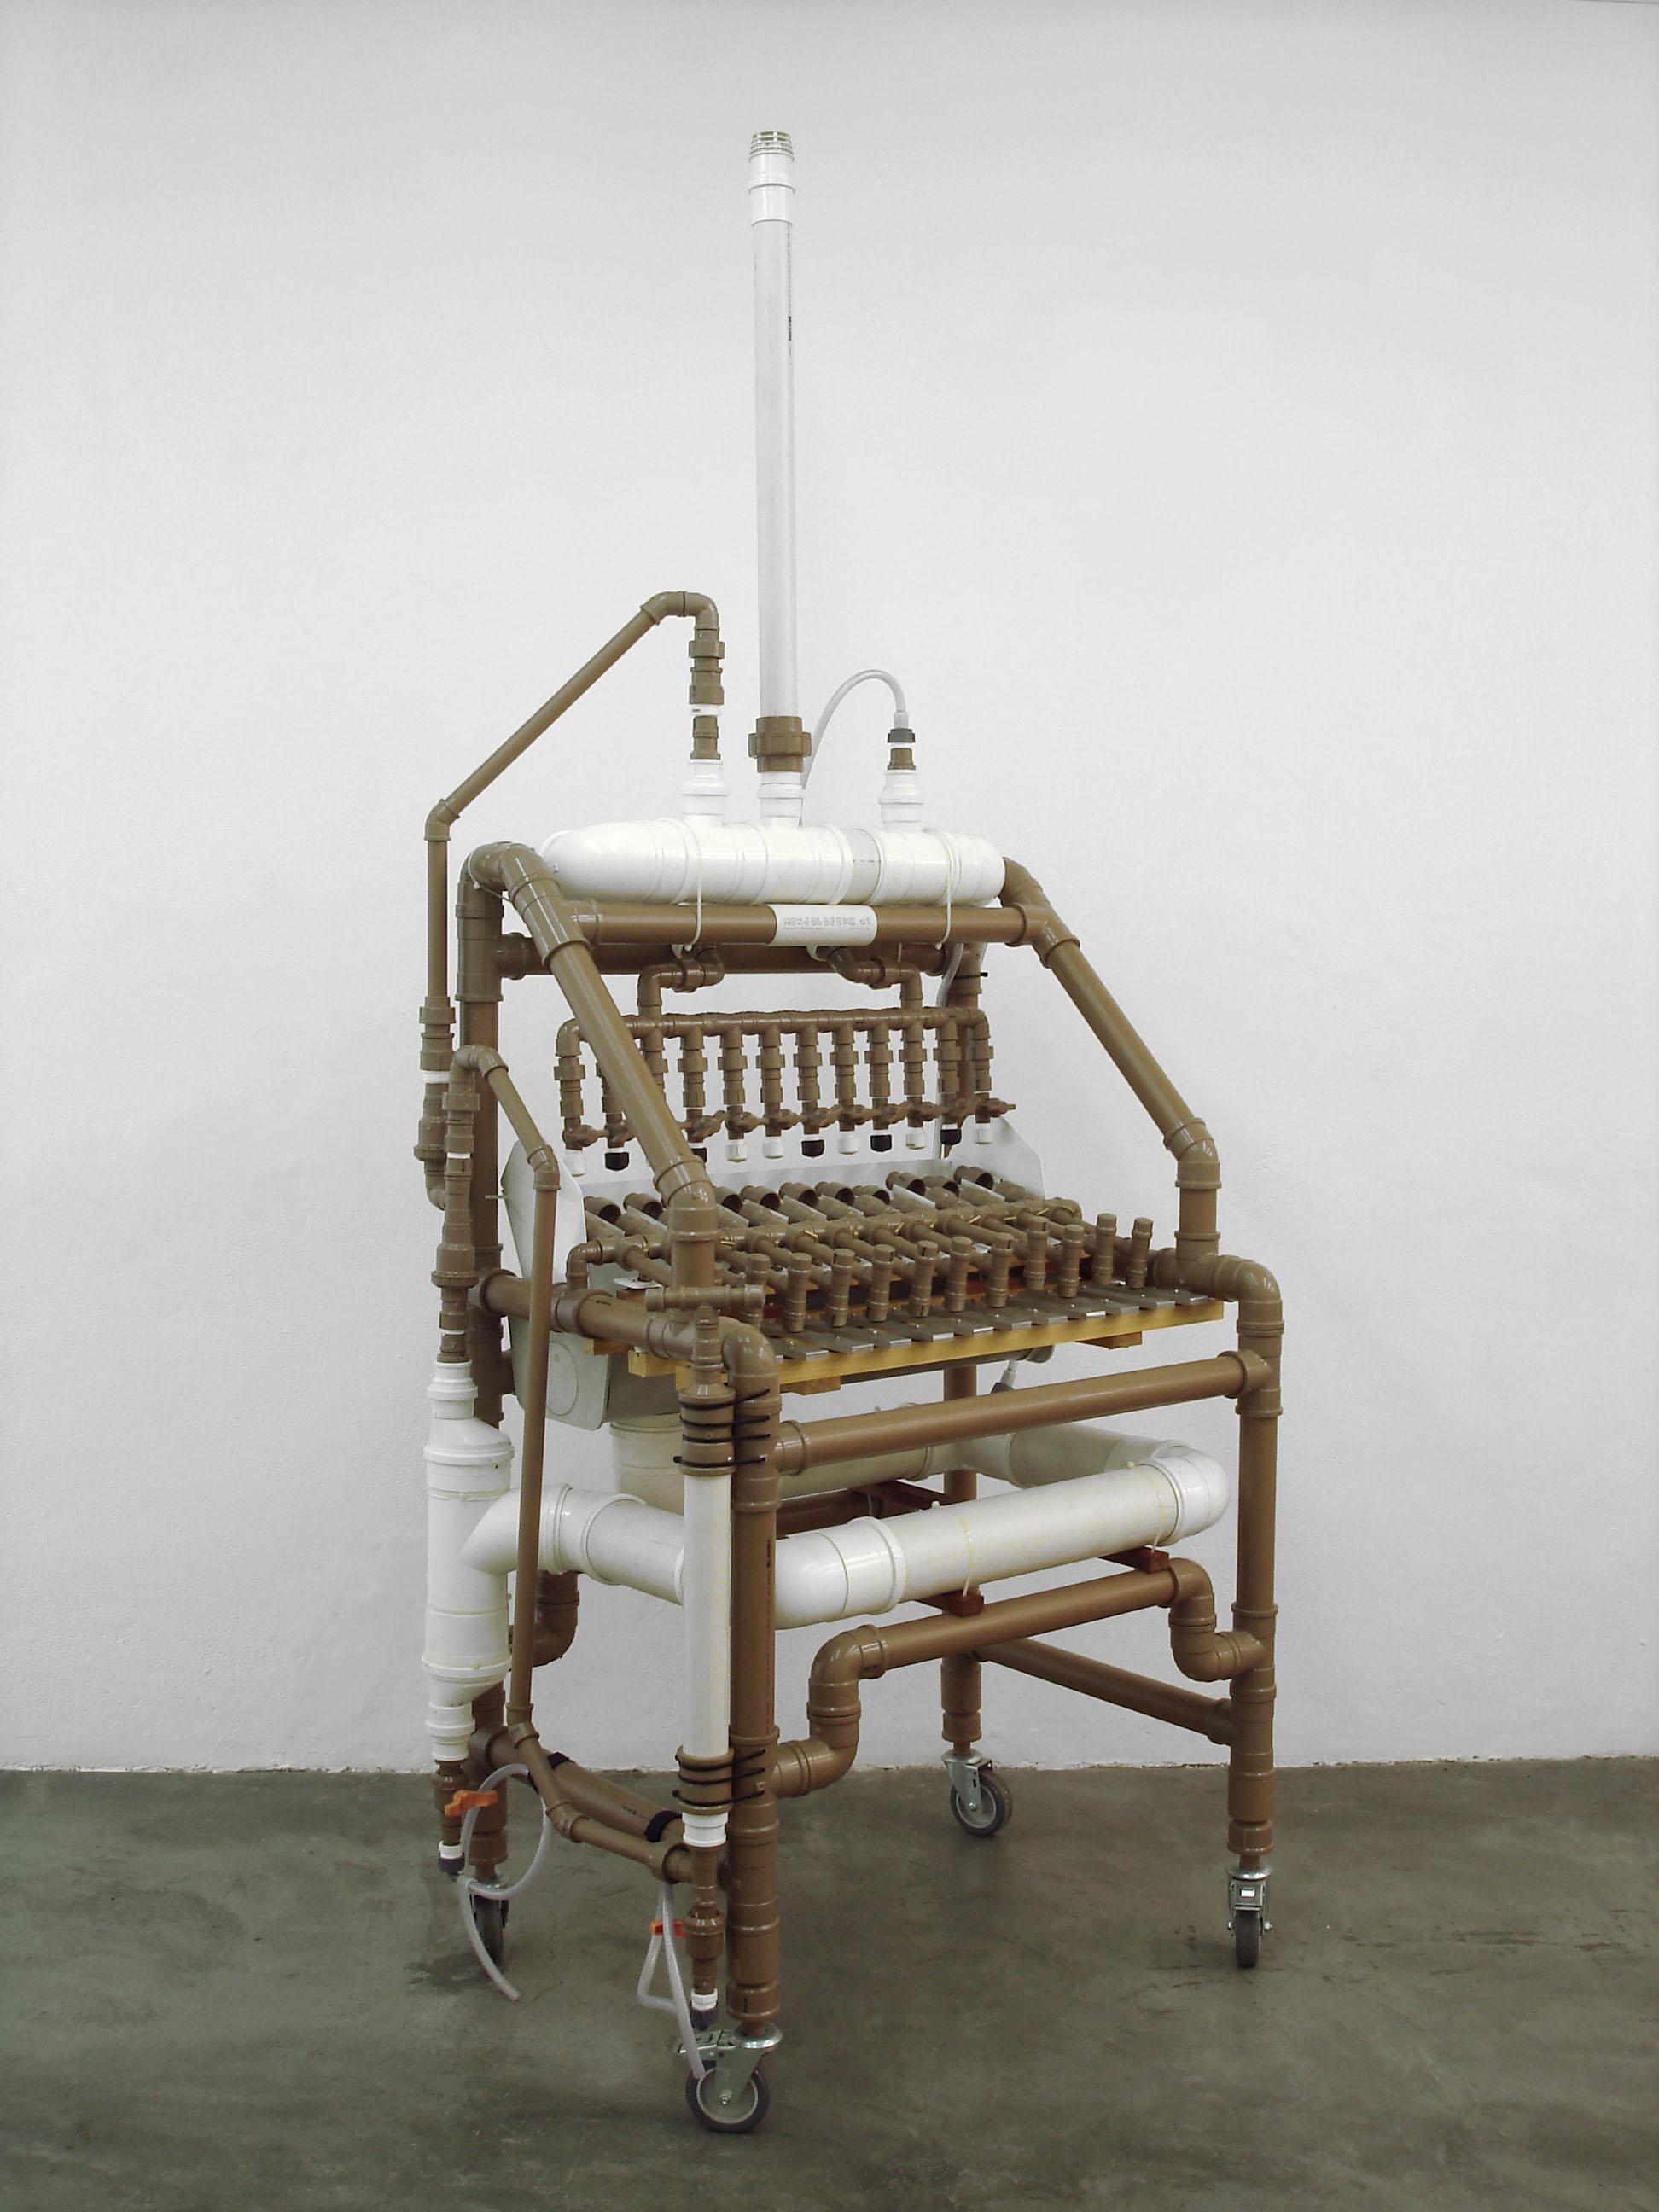 Monjolofone (2010) - Paulo Nenflidio